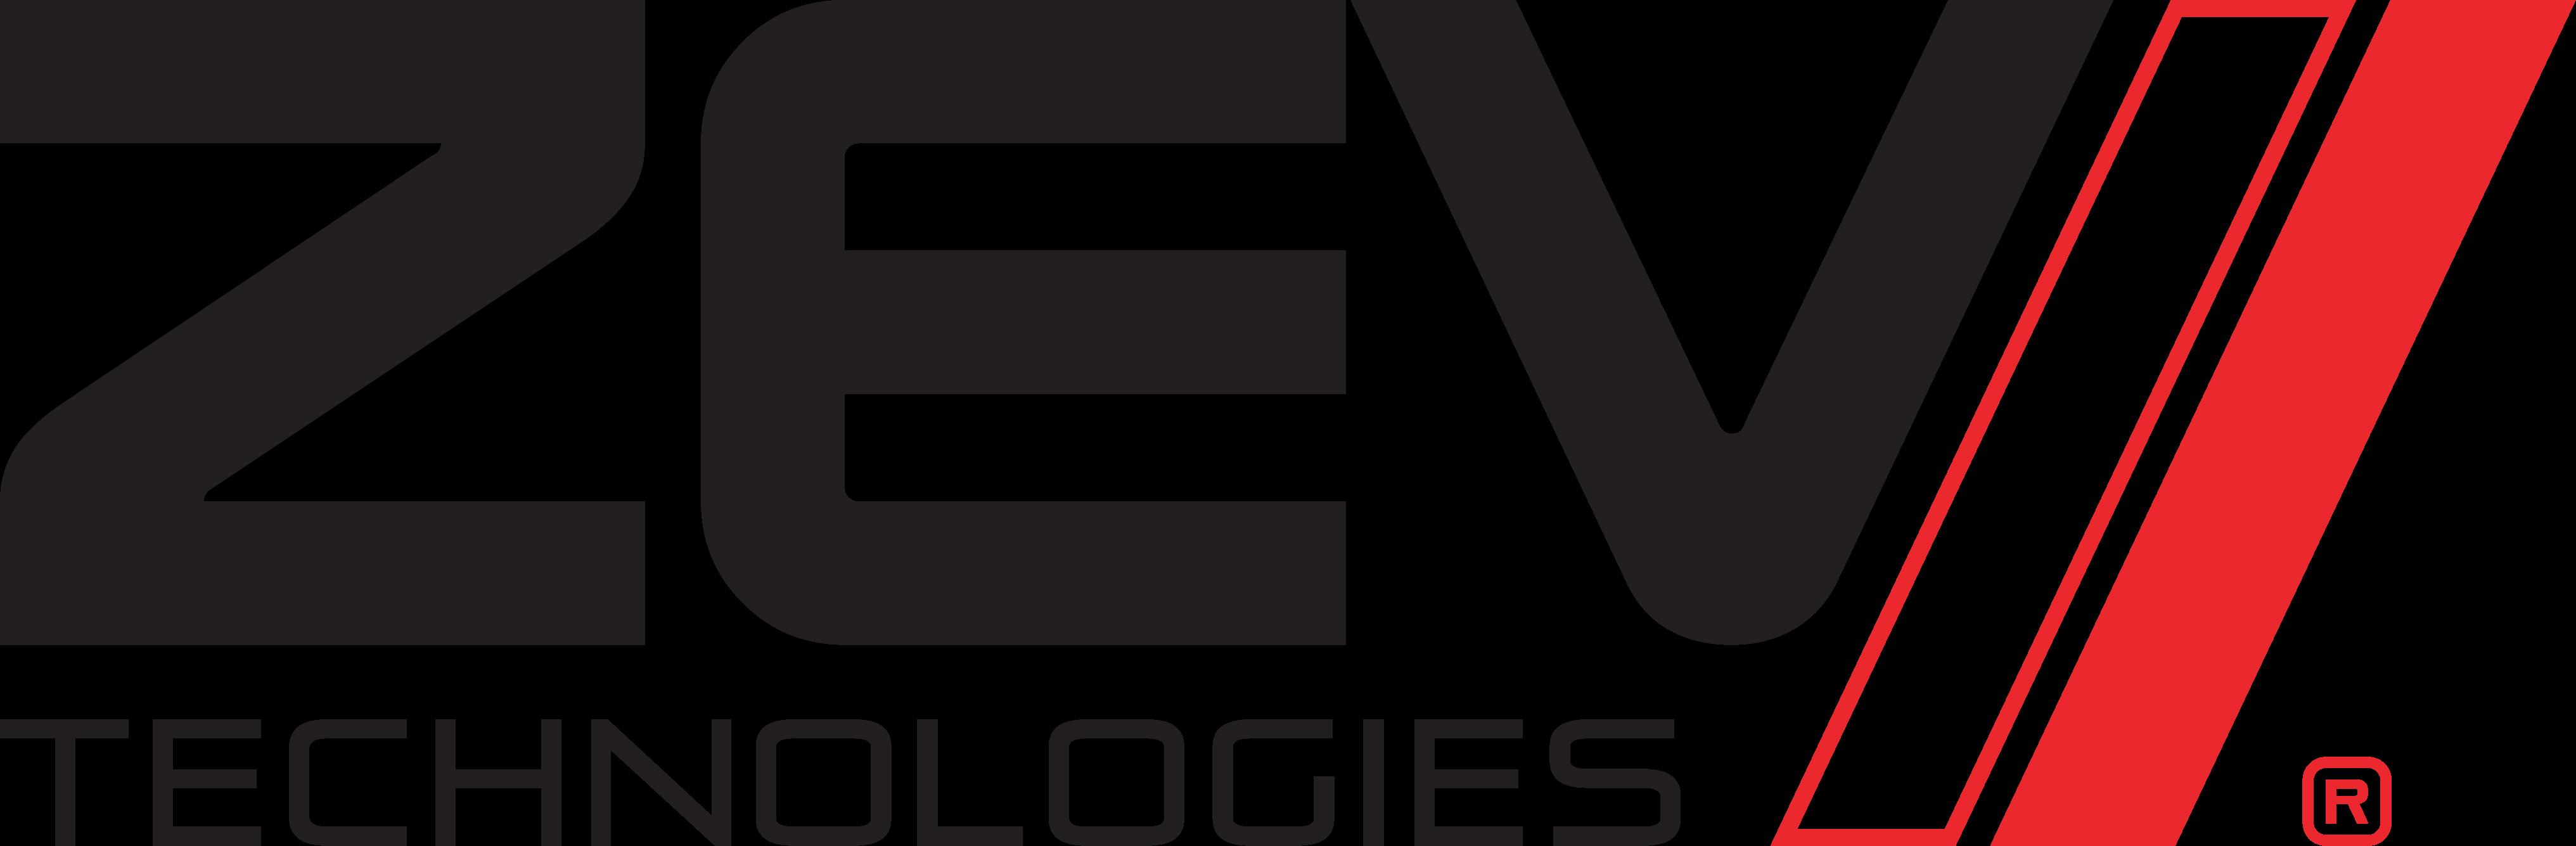 logo-zev.png